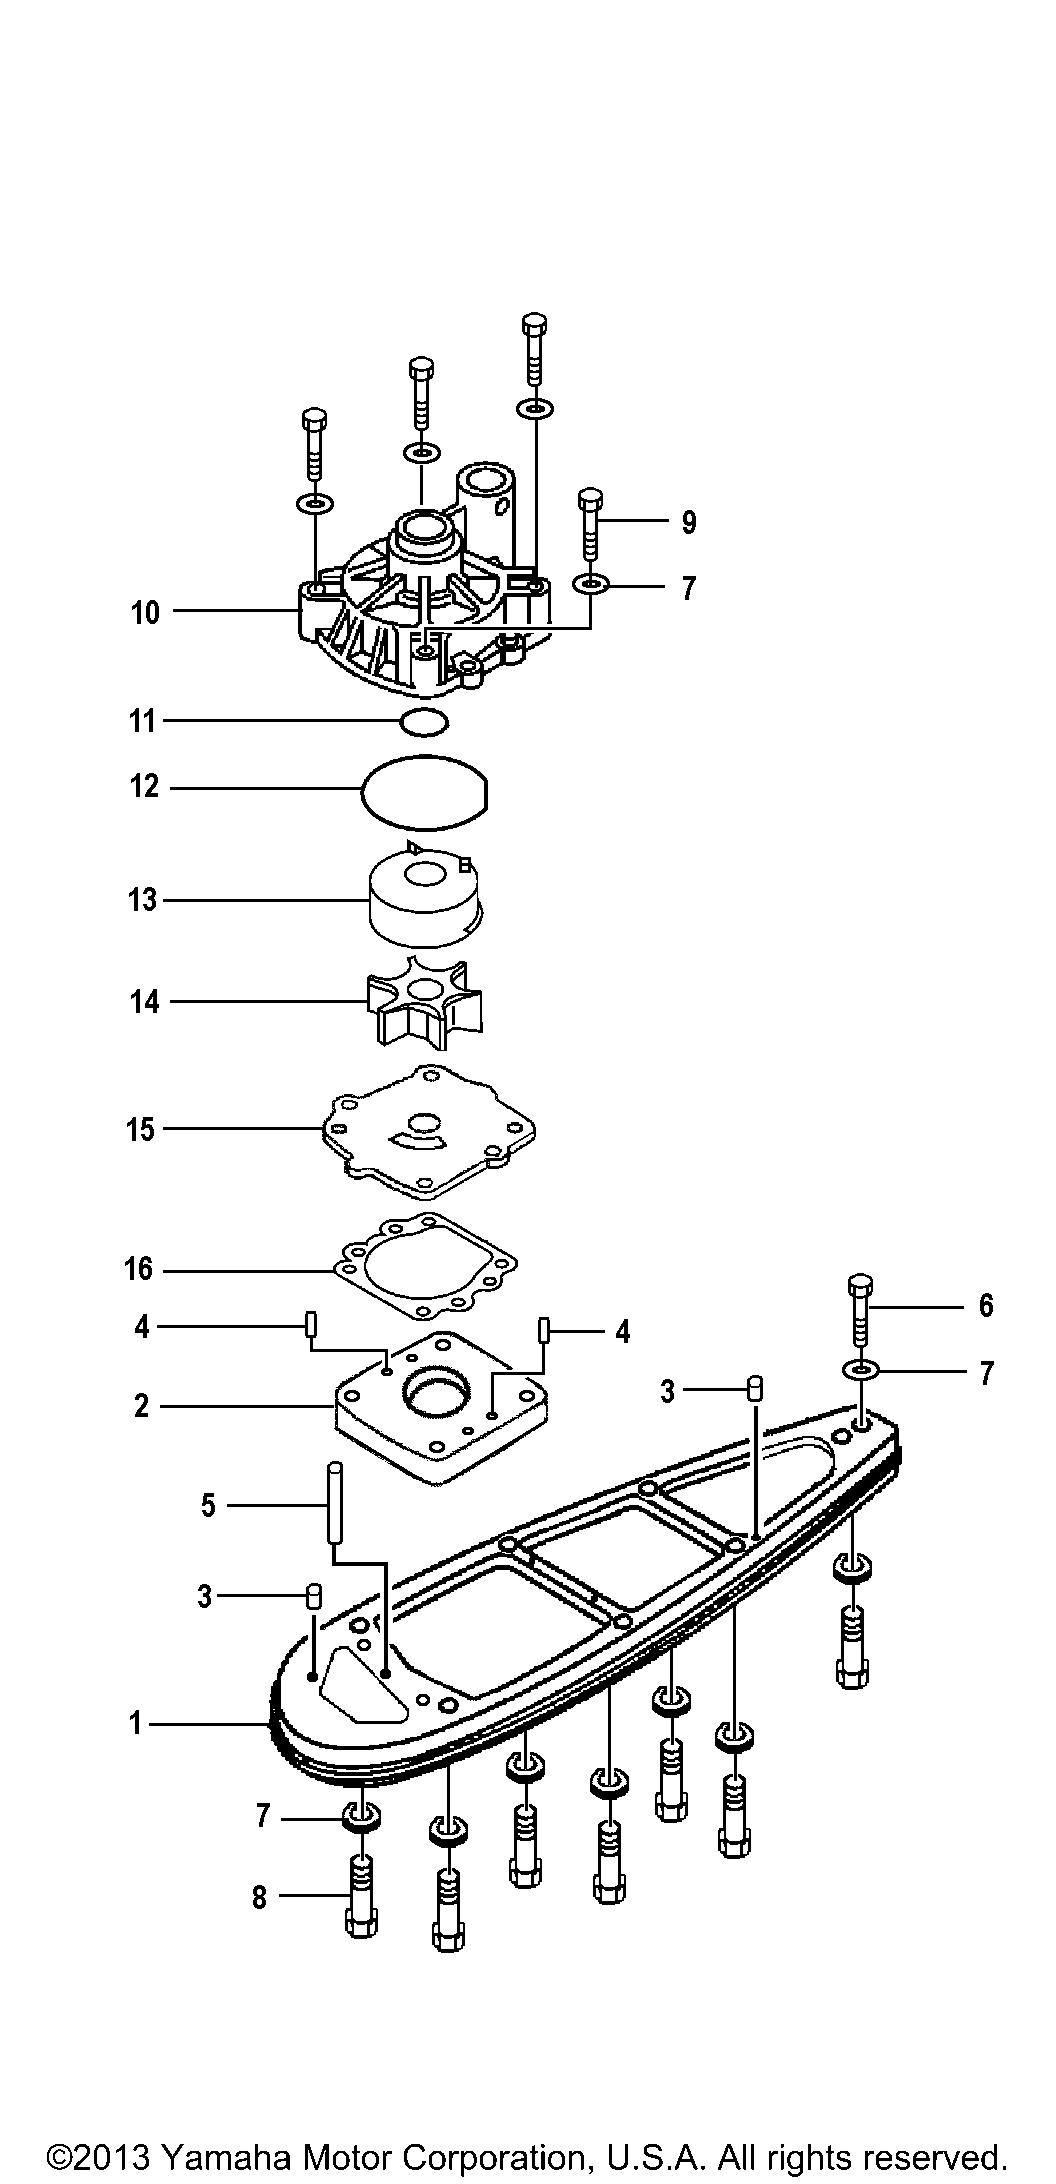 yamaha 150 outboard water pump diagram